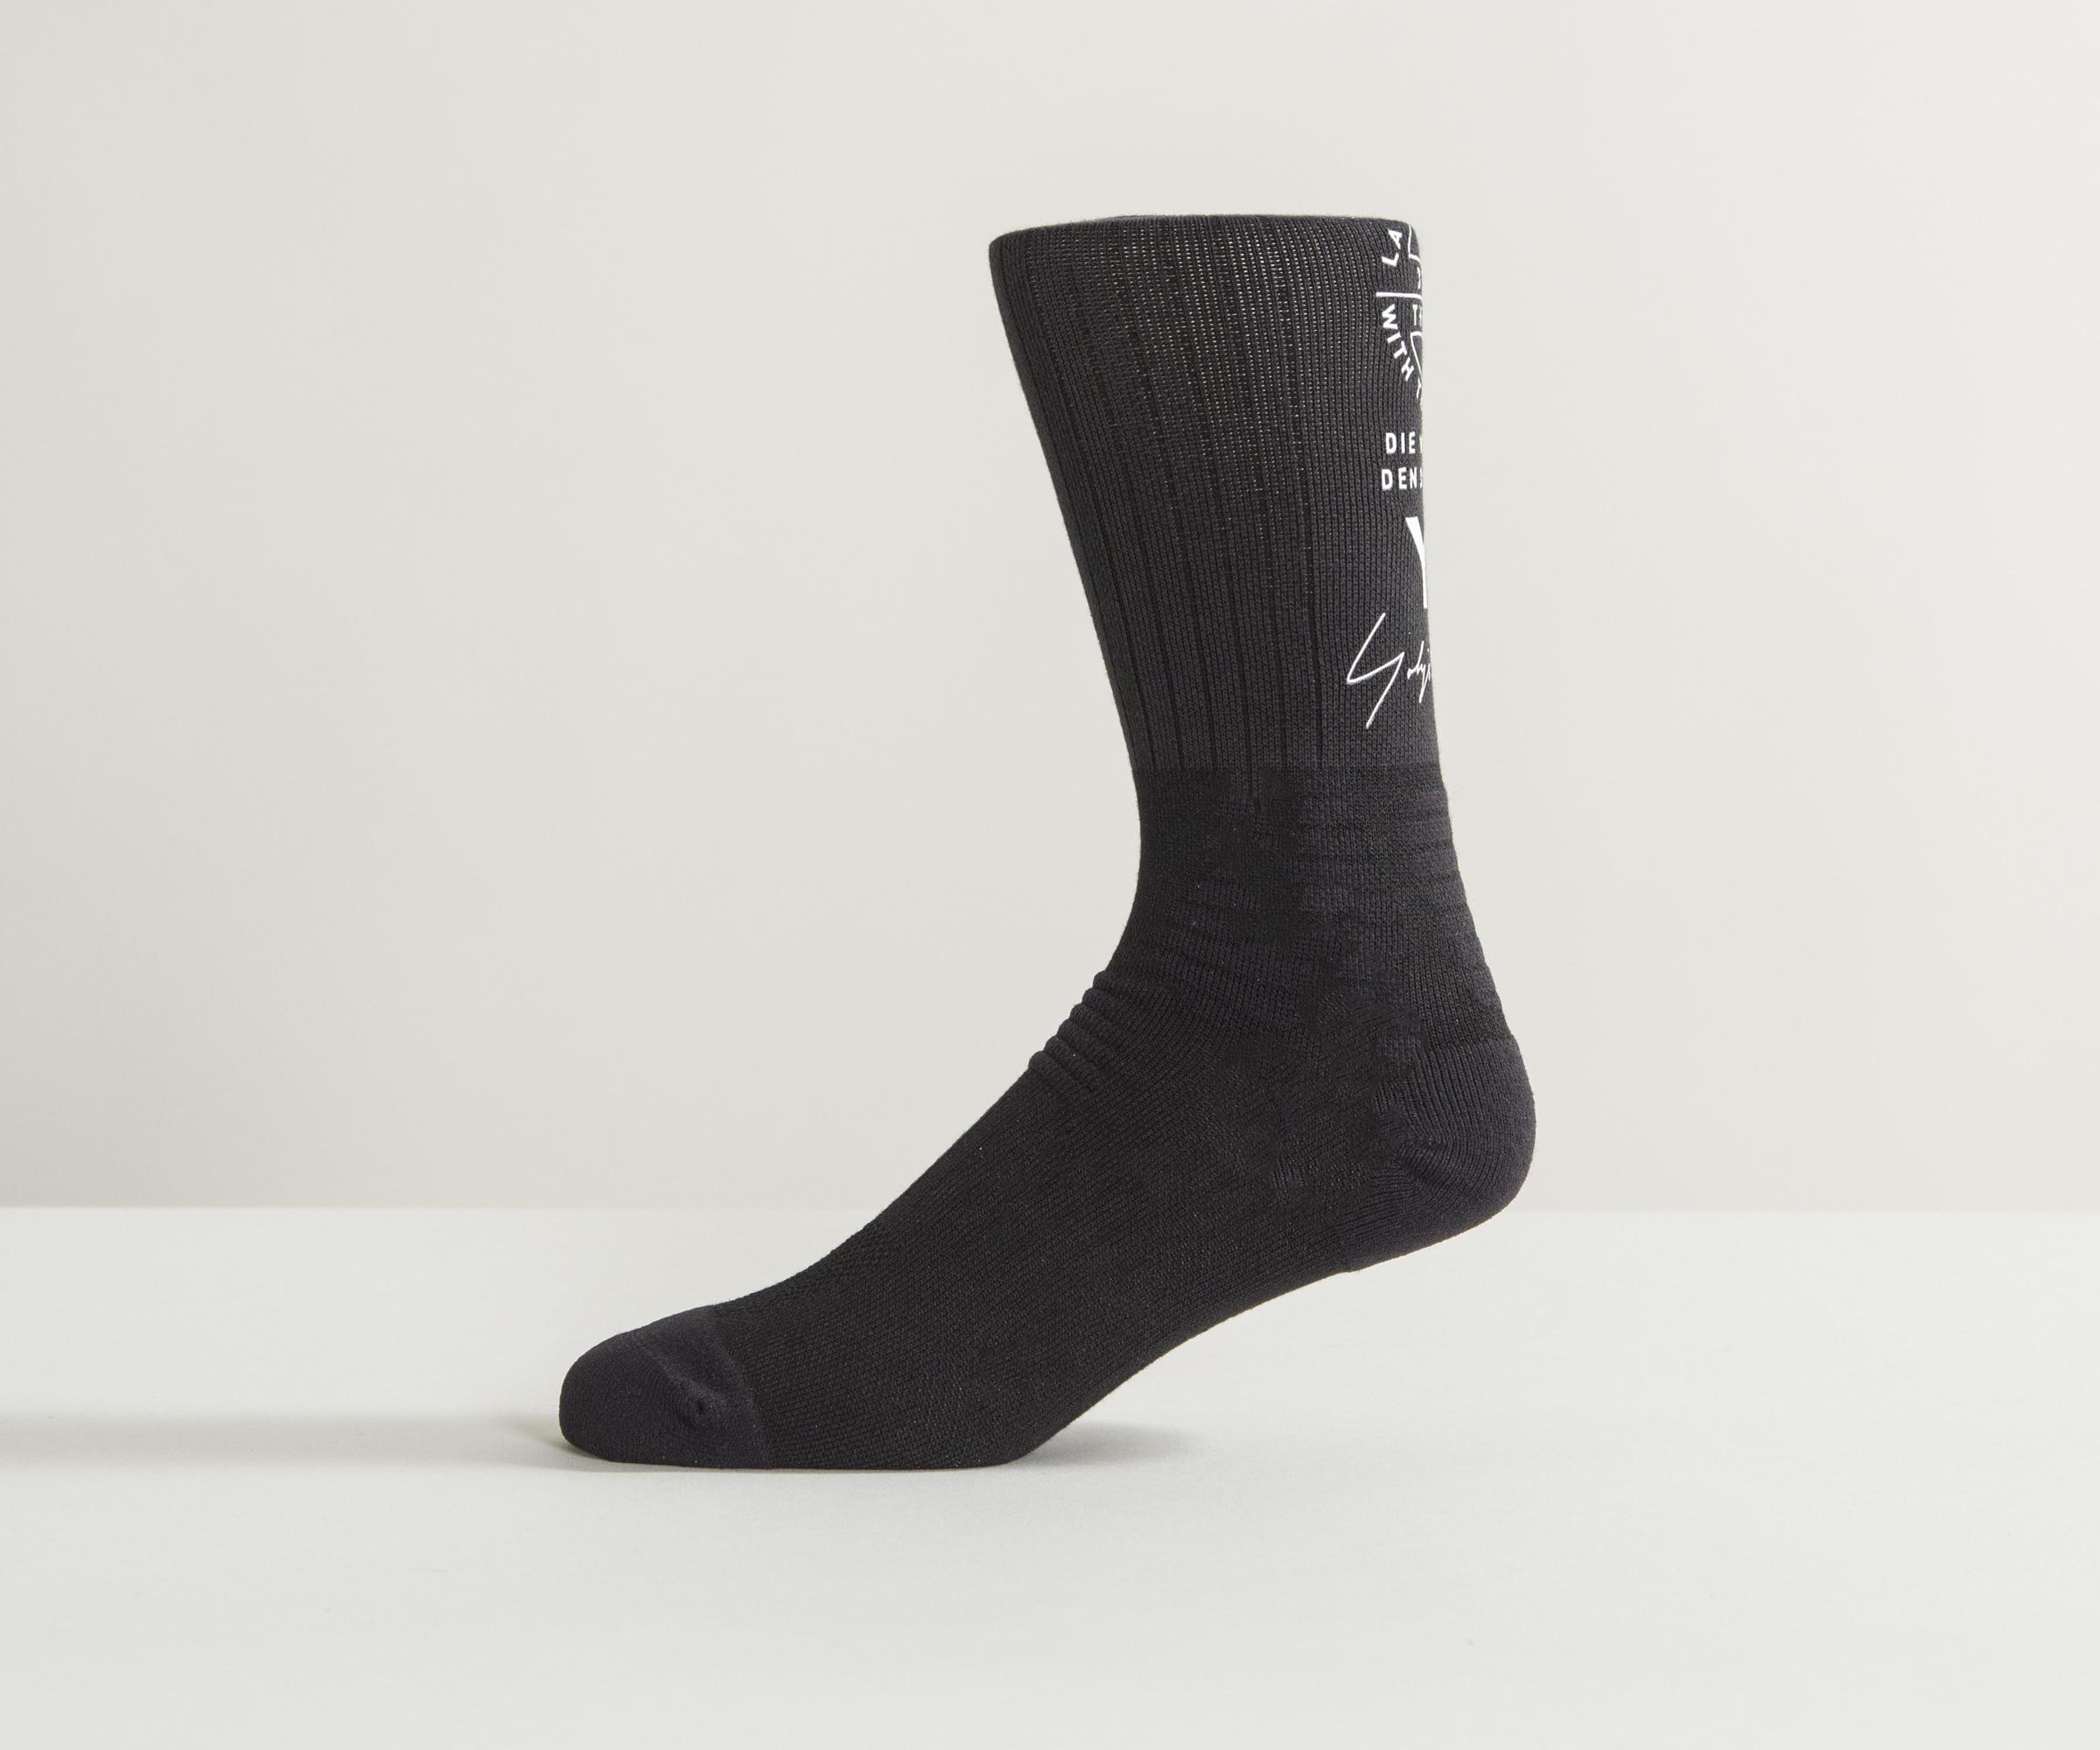 0f5d0b932 Y-3 Logo Tube Socks Black in Black for Men - Lyst